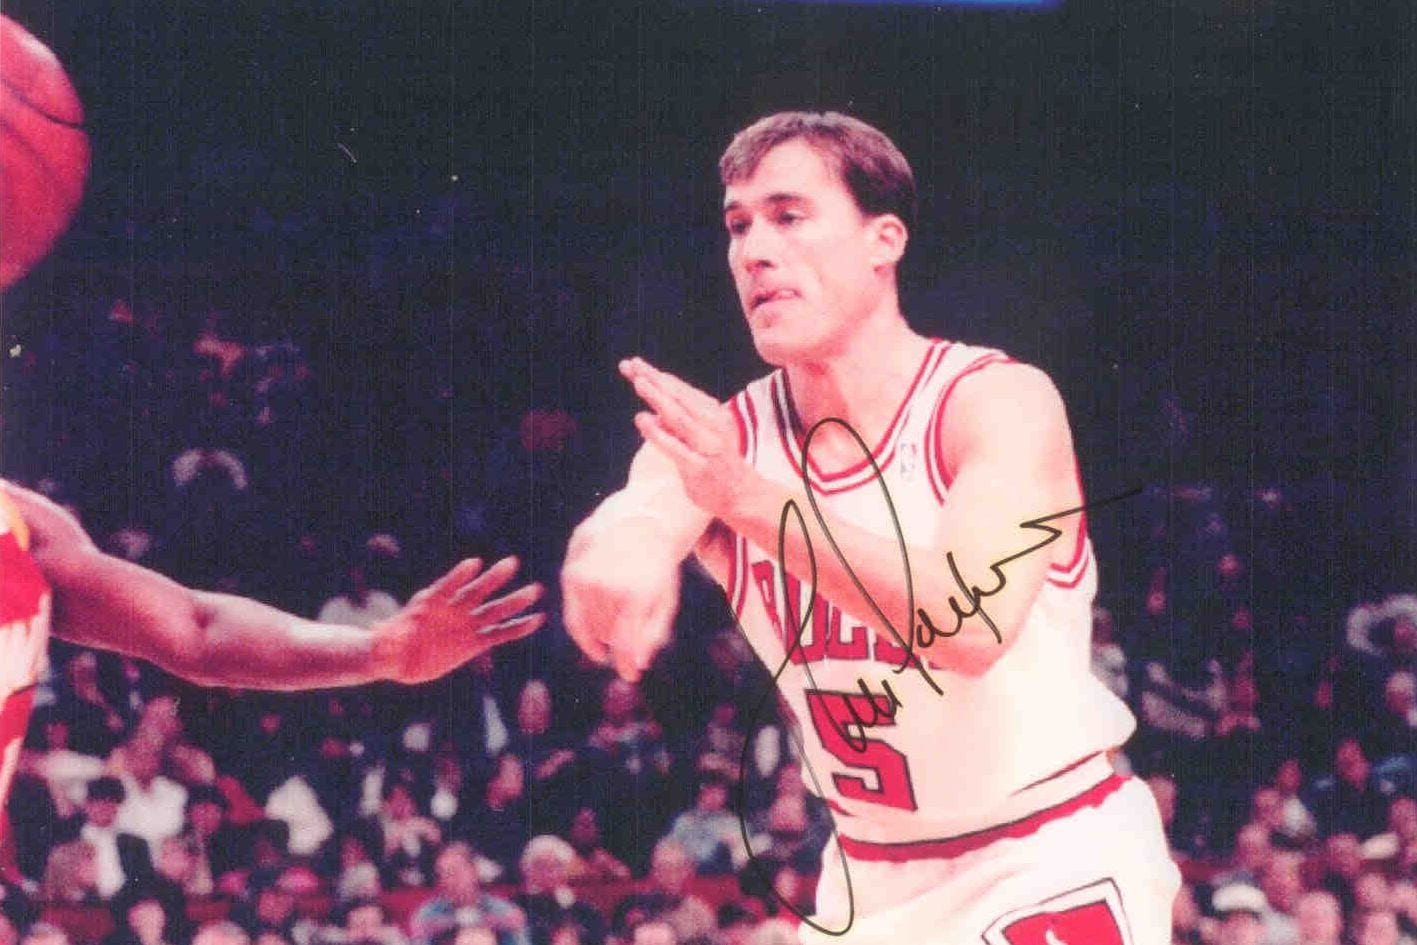 An autographed photo of John Paxon